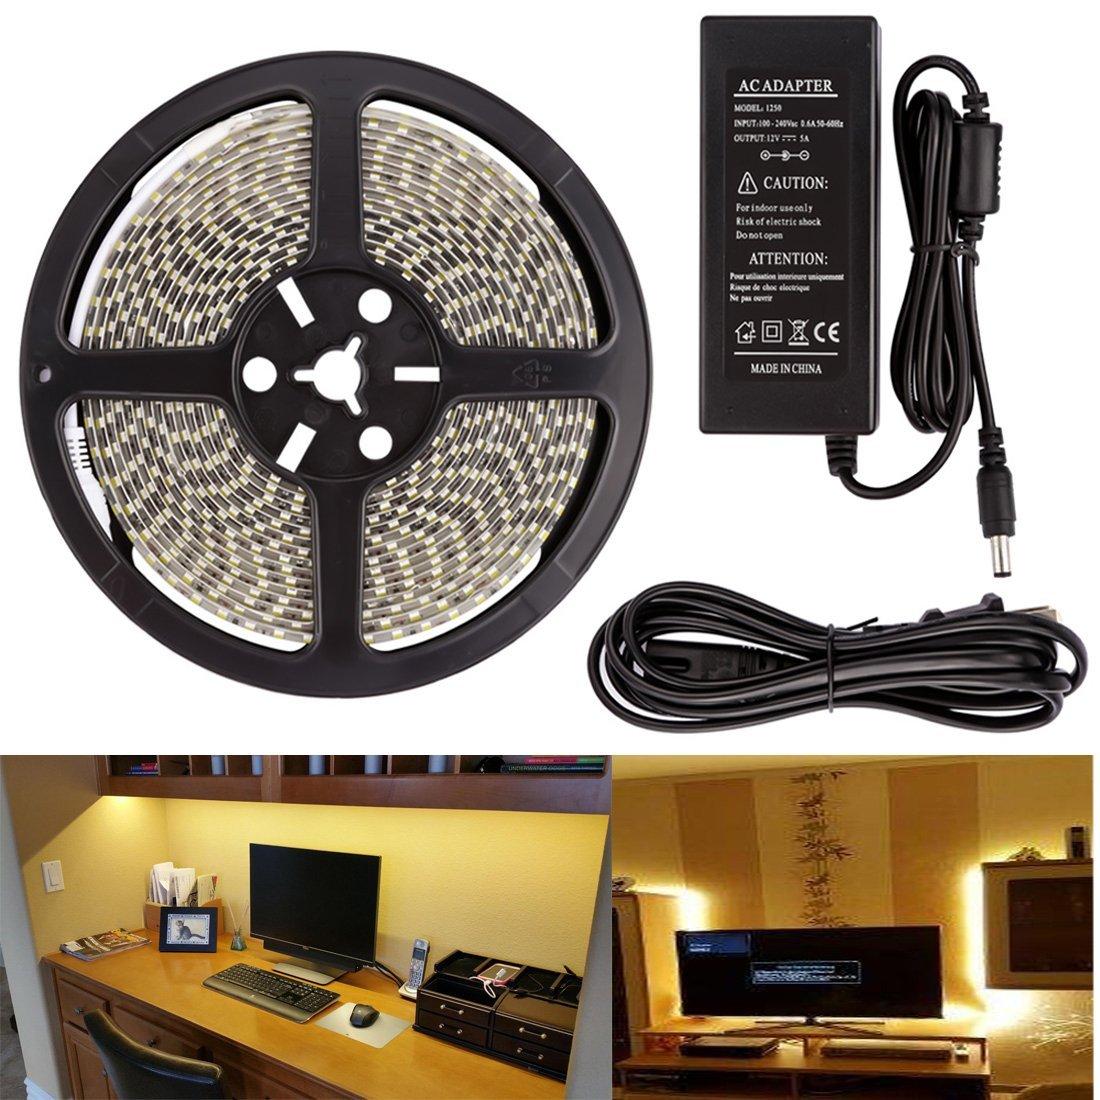 LEDMO SMD 5050 LED Strip, Warm White 3000K, 16.4Ft, Super Bright 300 Units, Waterproof, Flexible LED Strip Lights, With DC12V 5A Power Supply